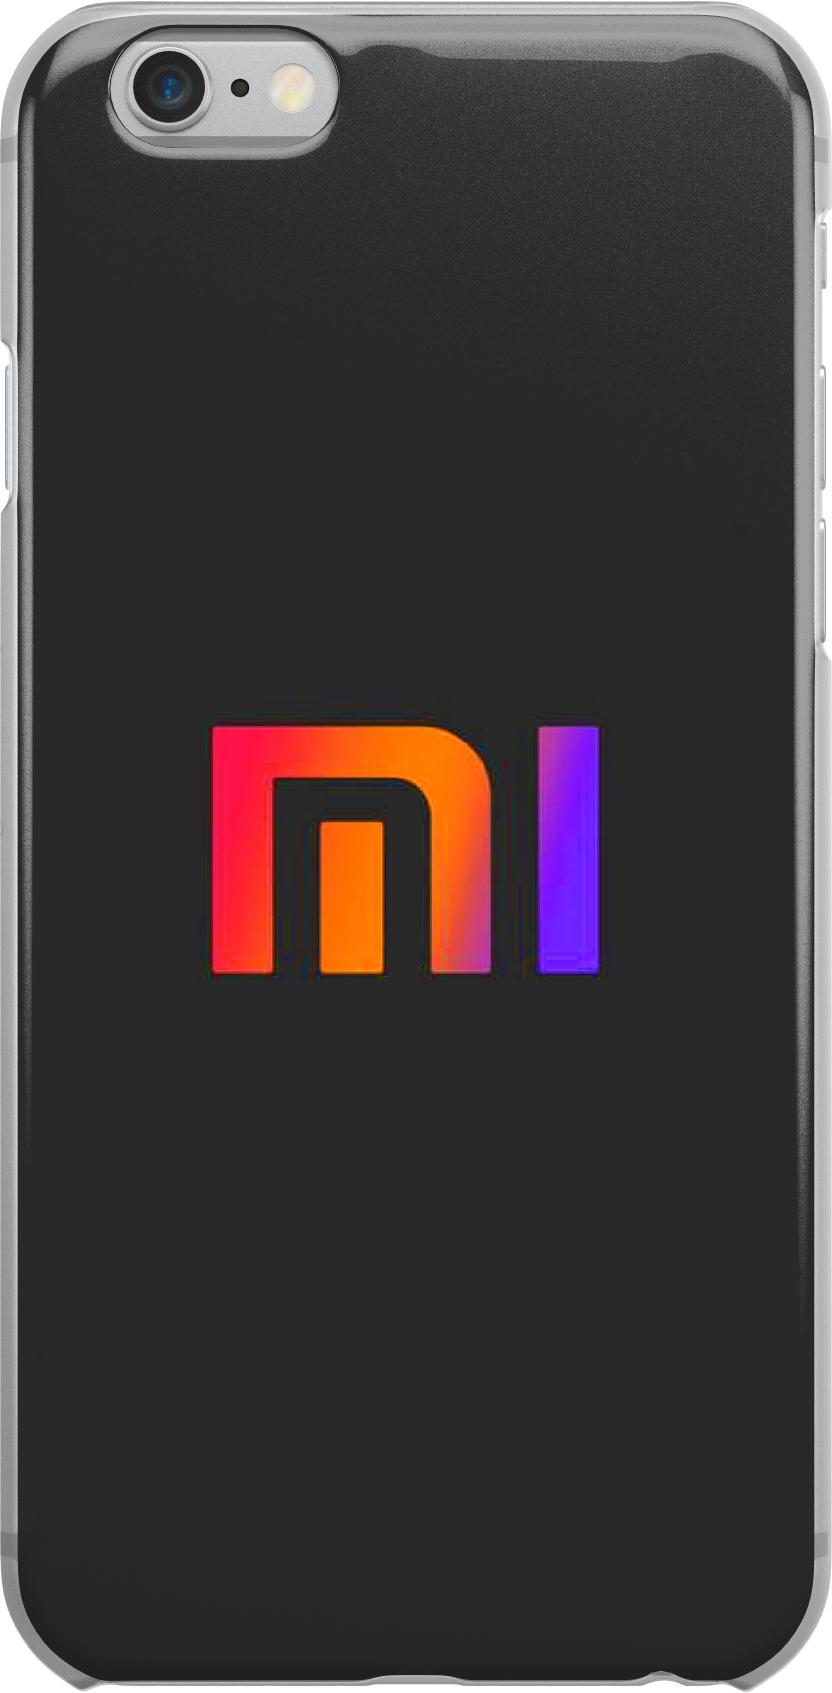 Etui Wzory Xiaomi Nokia 5